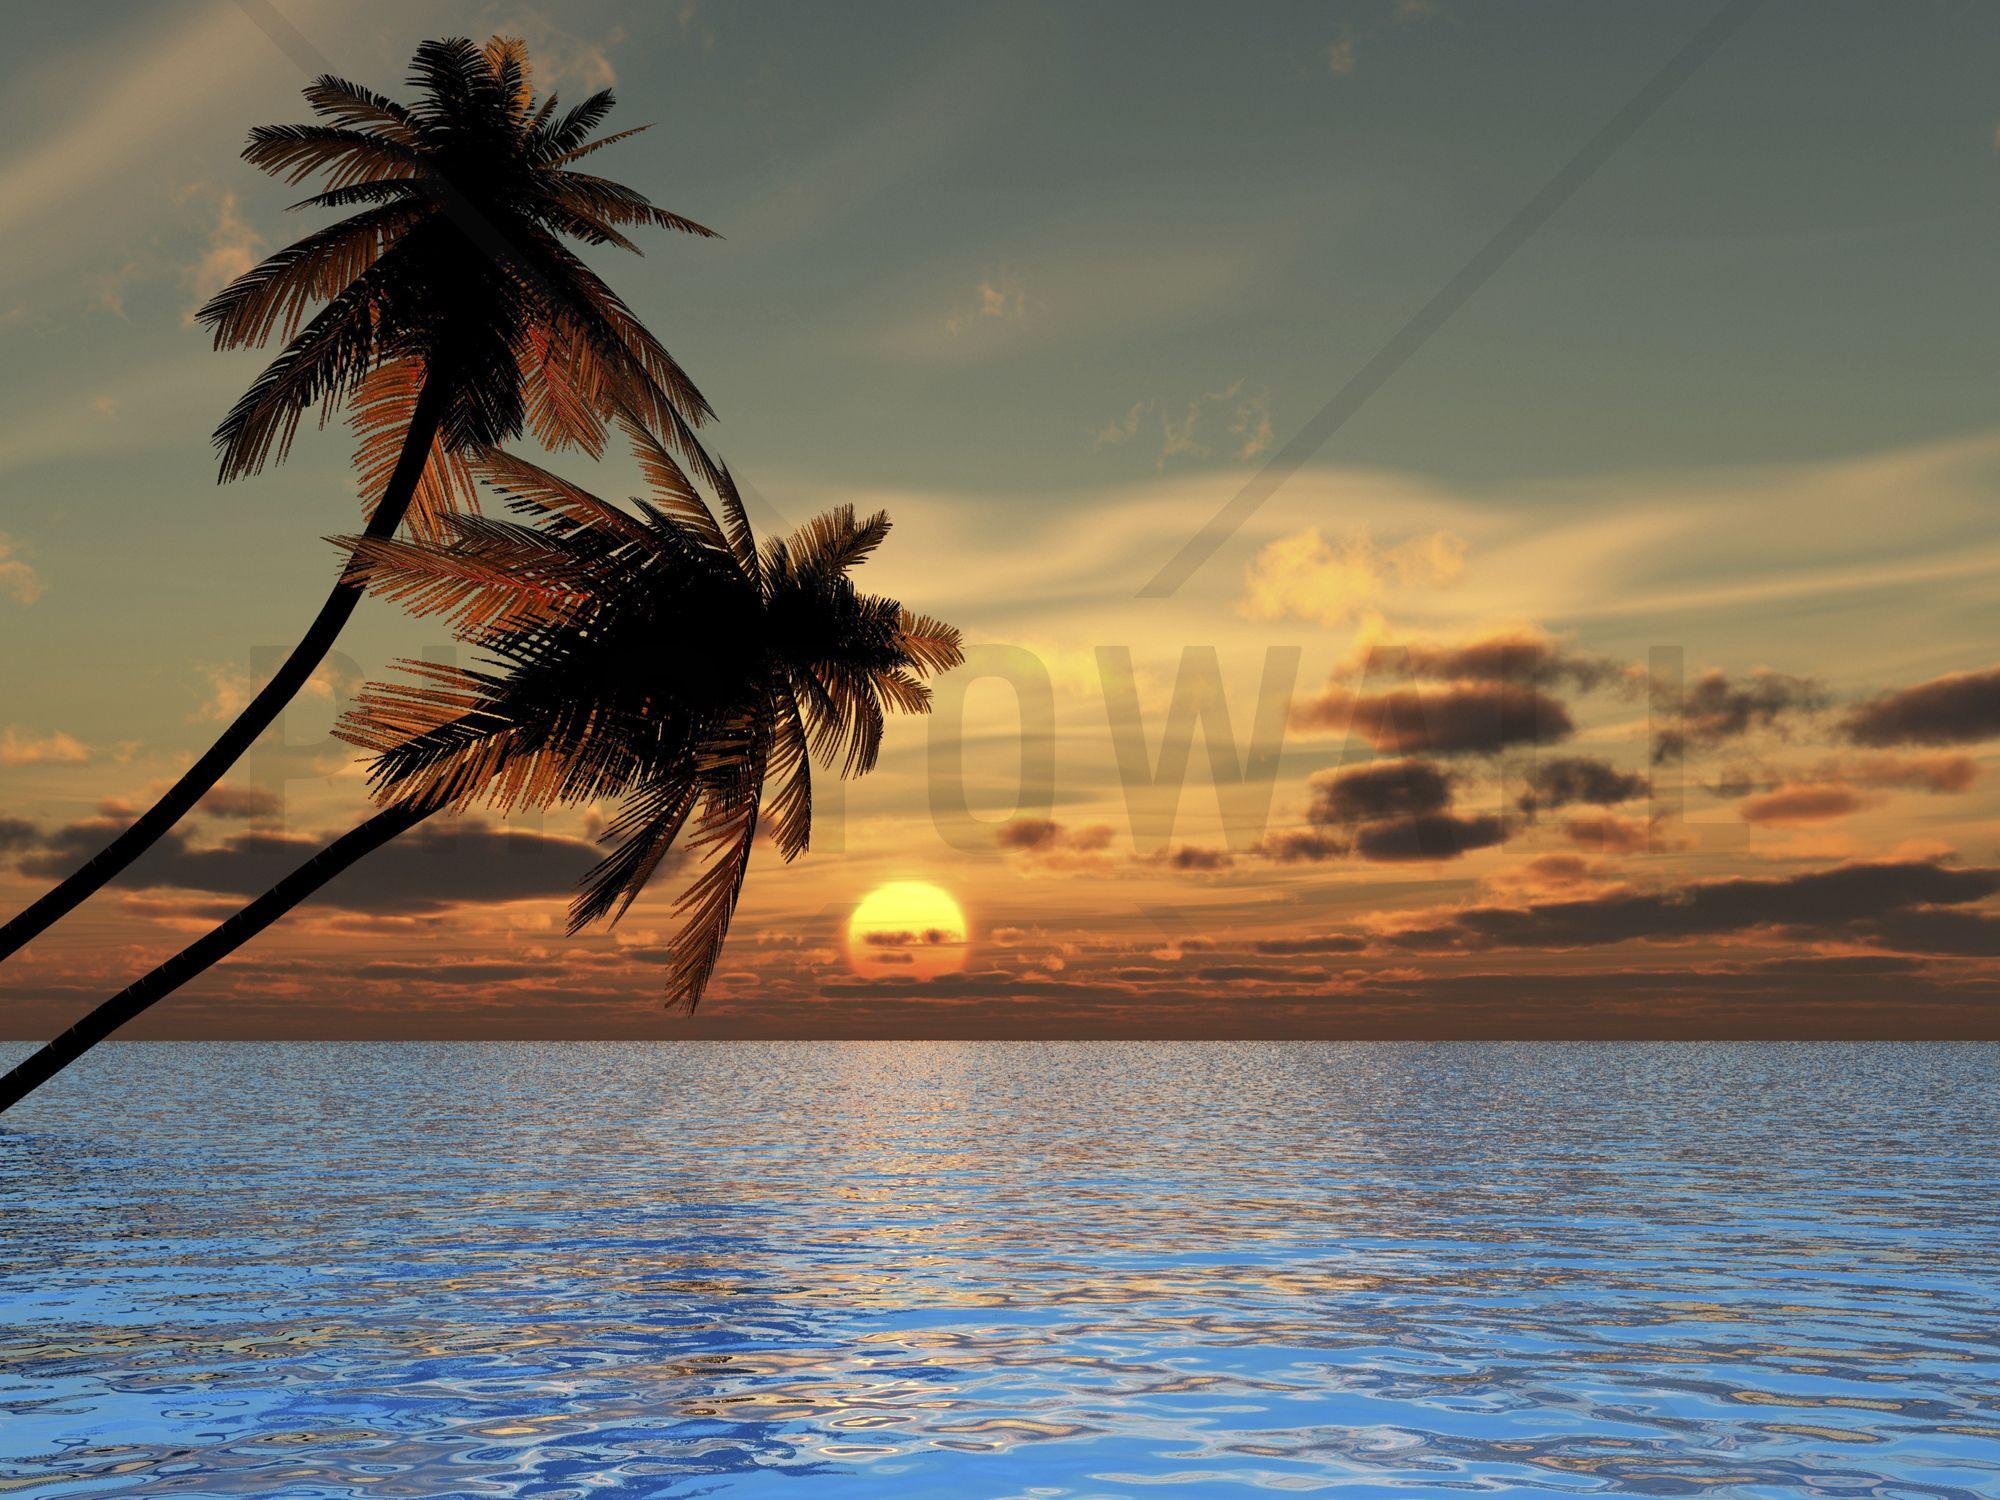 Coconut Palm Sunset - Fototapeter & Tapeter - Photowall